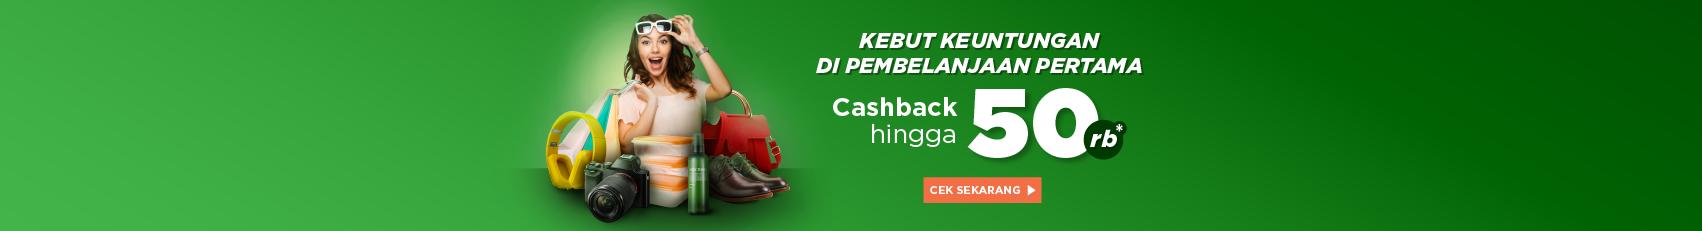 Mulai Belanja di Marketplace & Official Store Dapatkan Cashback hingga Rp50.000